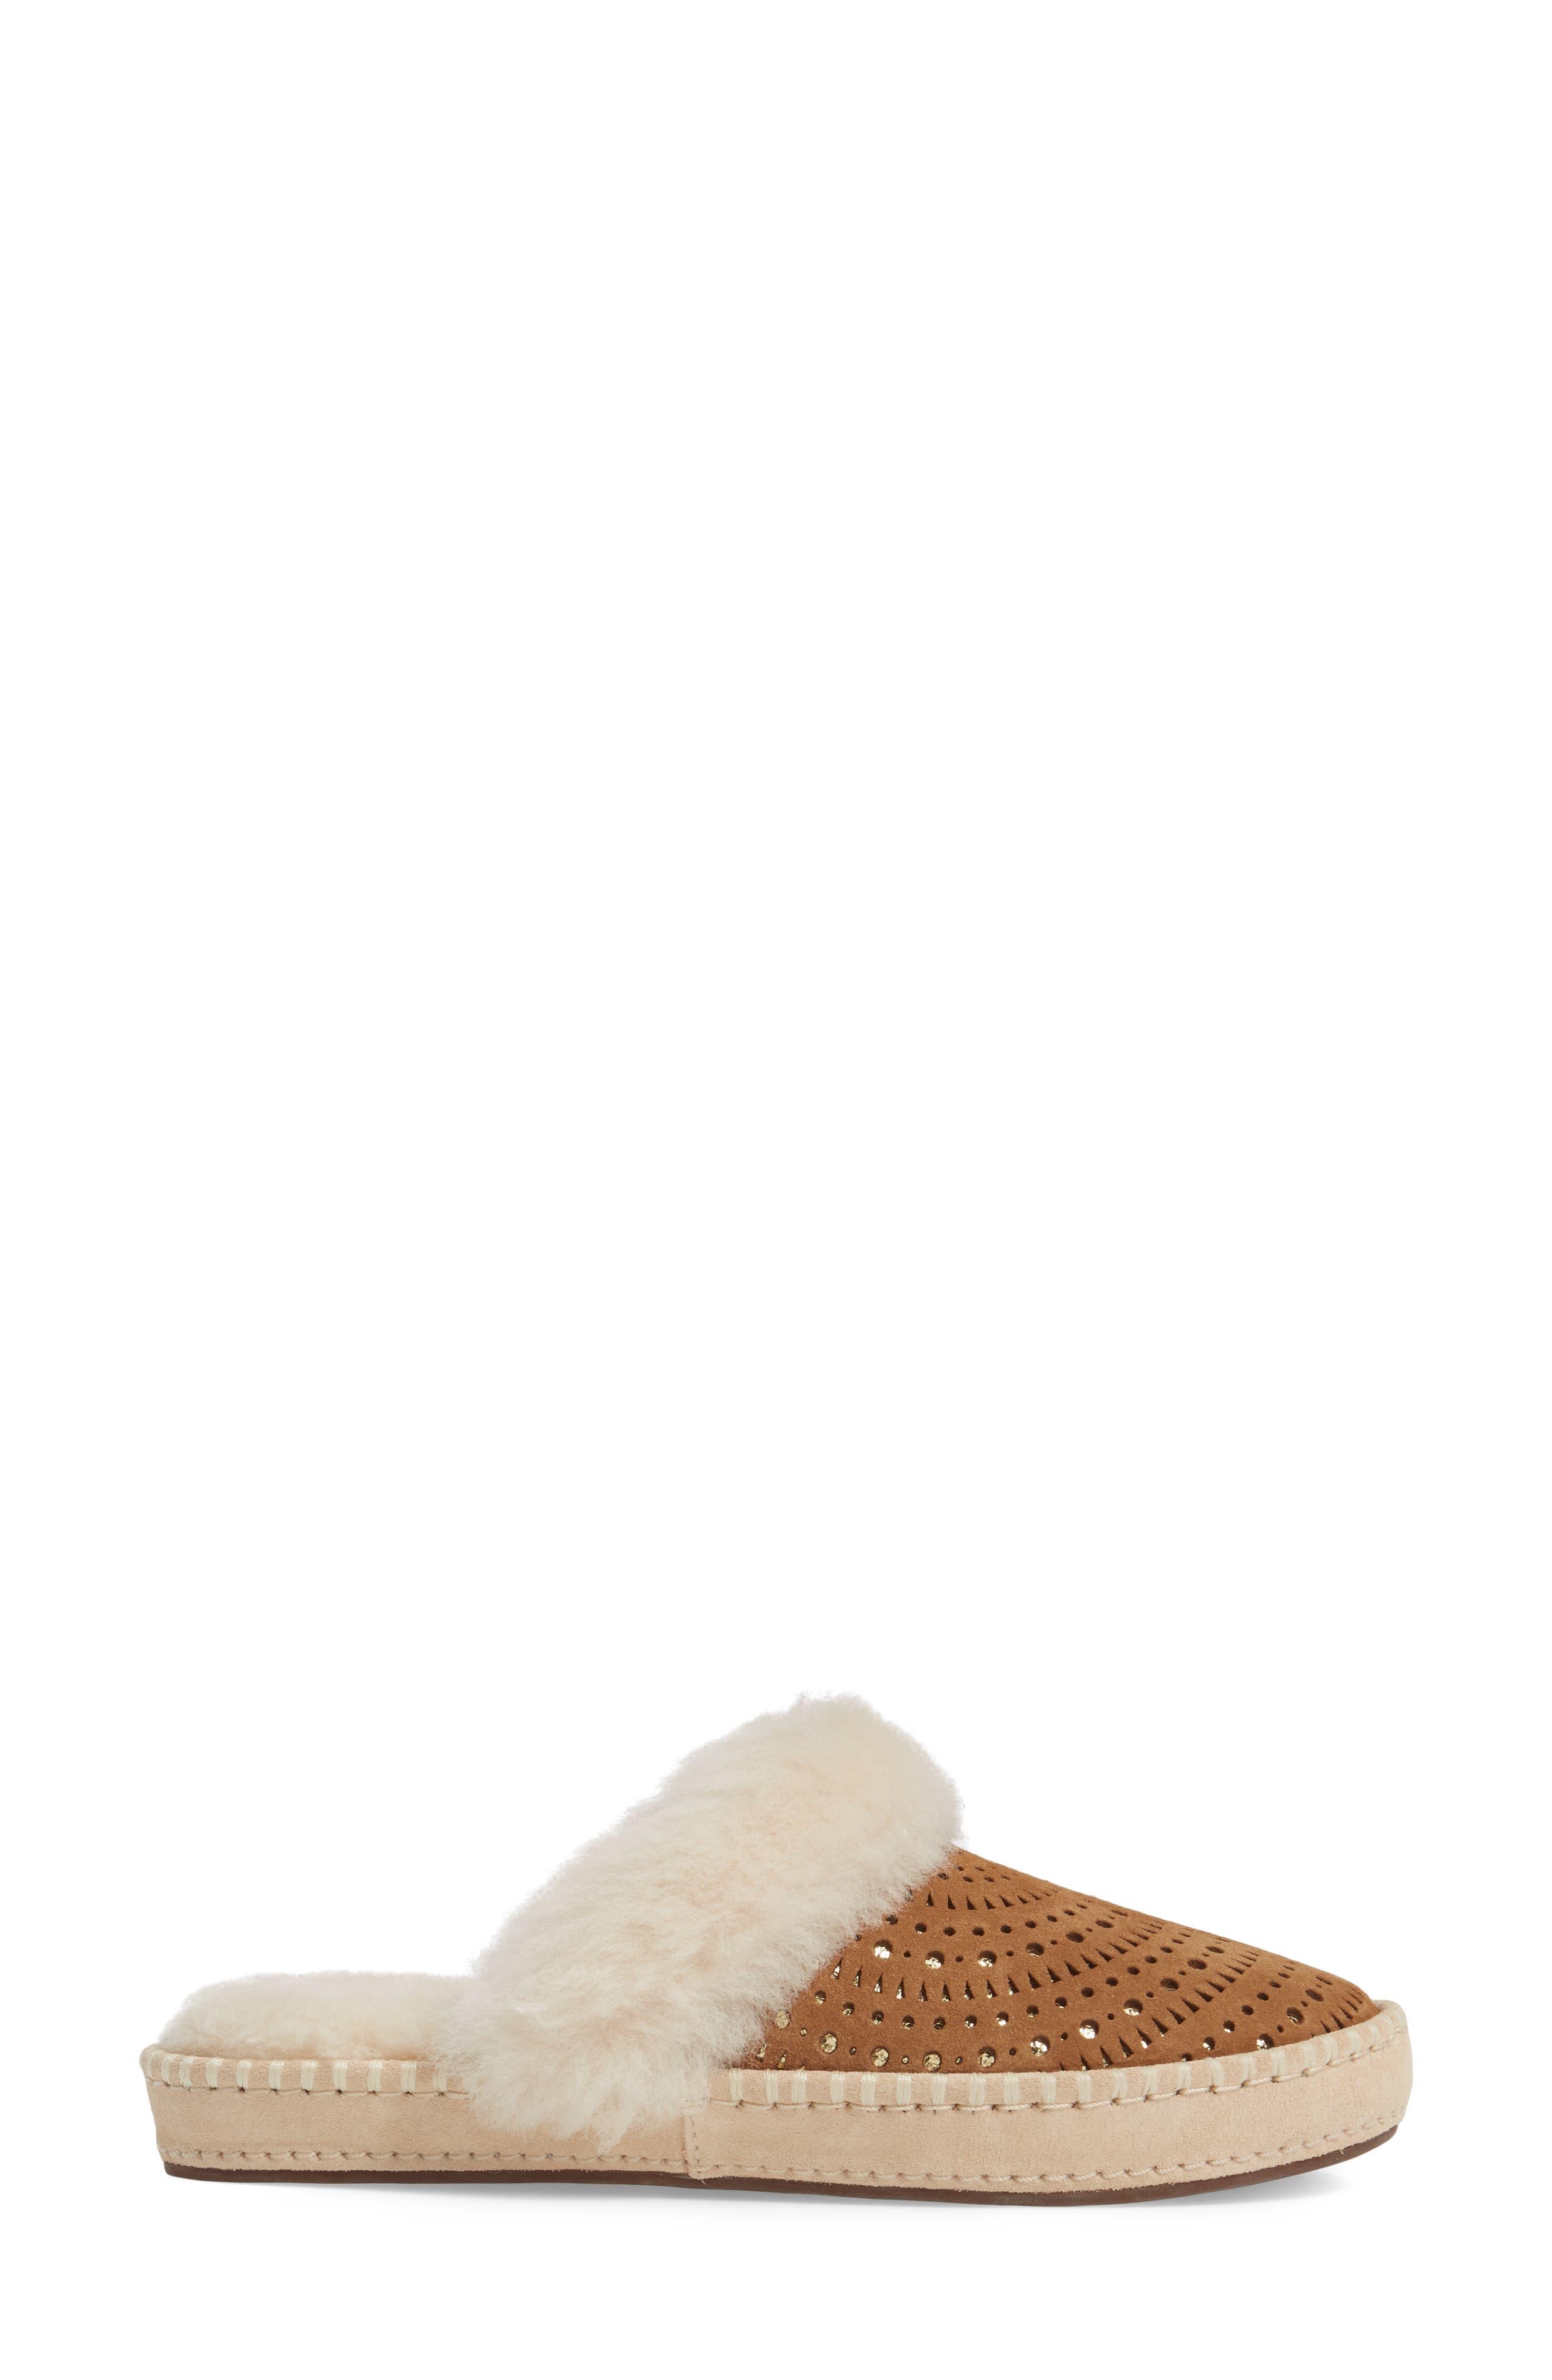 Aira Sunshine Genuine Shearling Slipper,                             Alternate thumbnail 4, color,                             Chestnut Suede